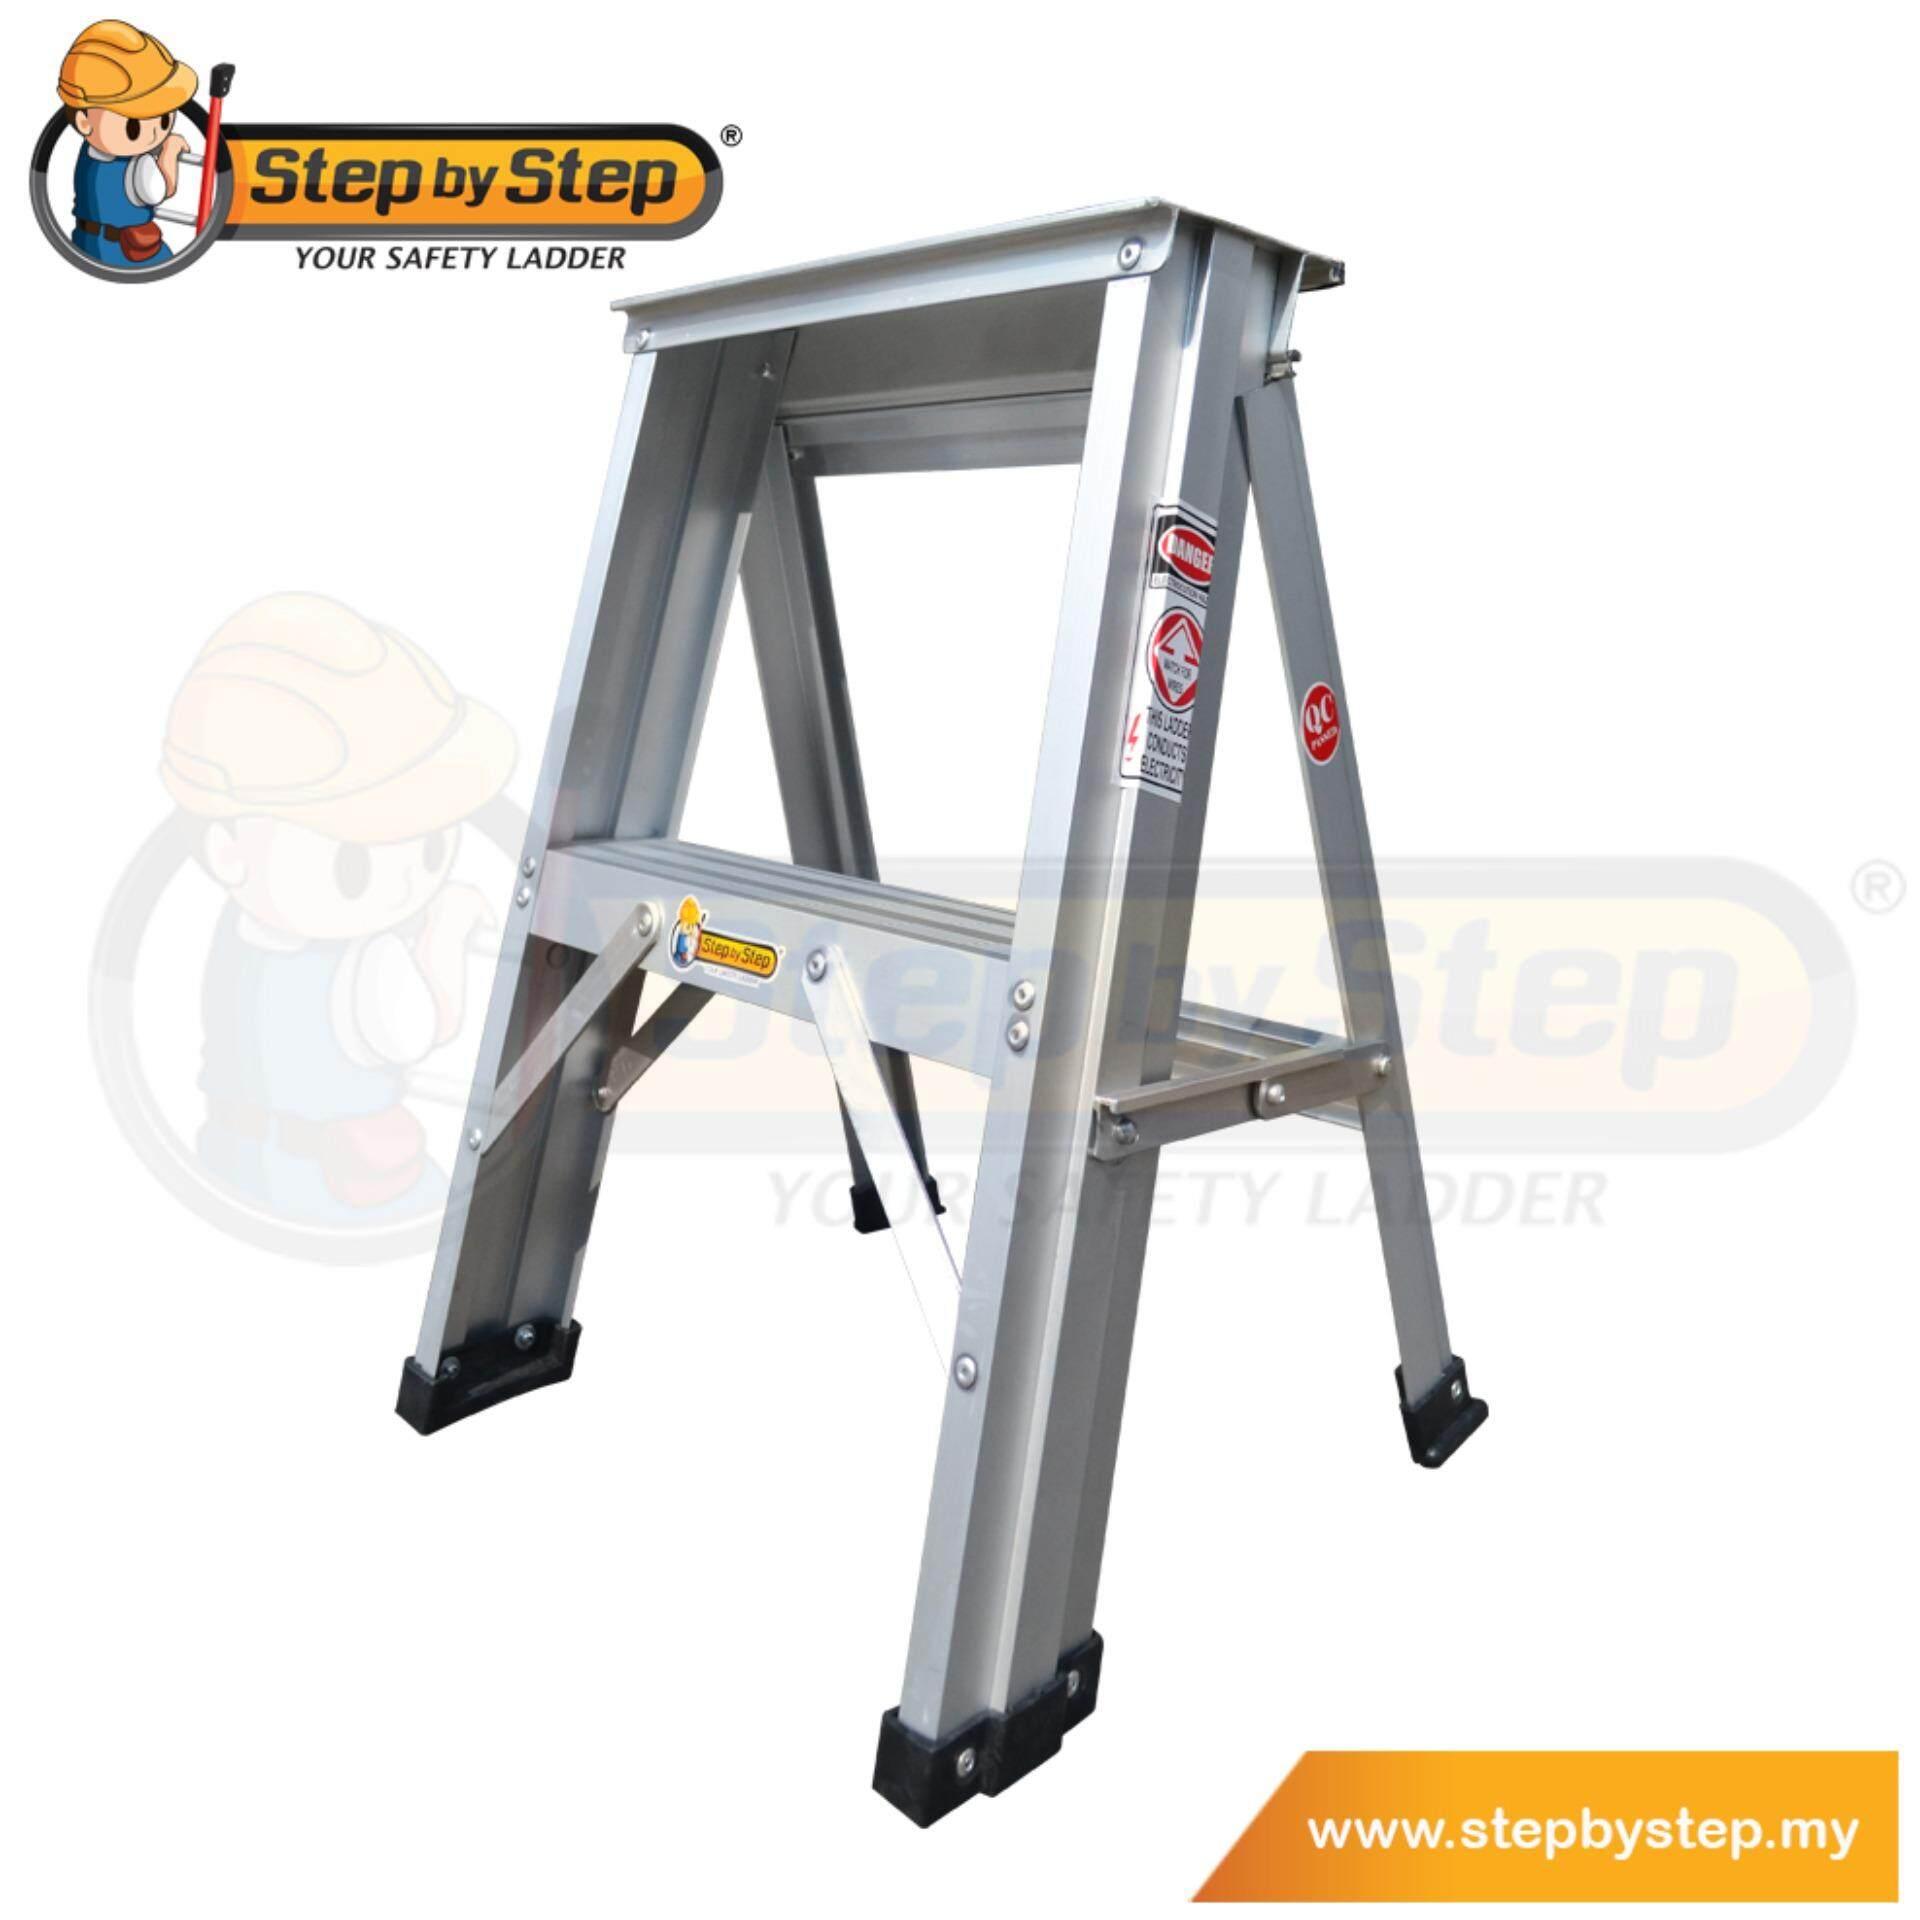 Step by Step Aluminium Single Sided A-Shape Ladder (SL02) - 2 Steps/ Step Stools